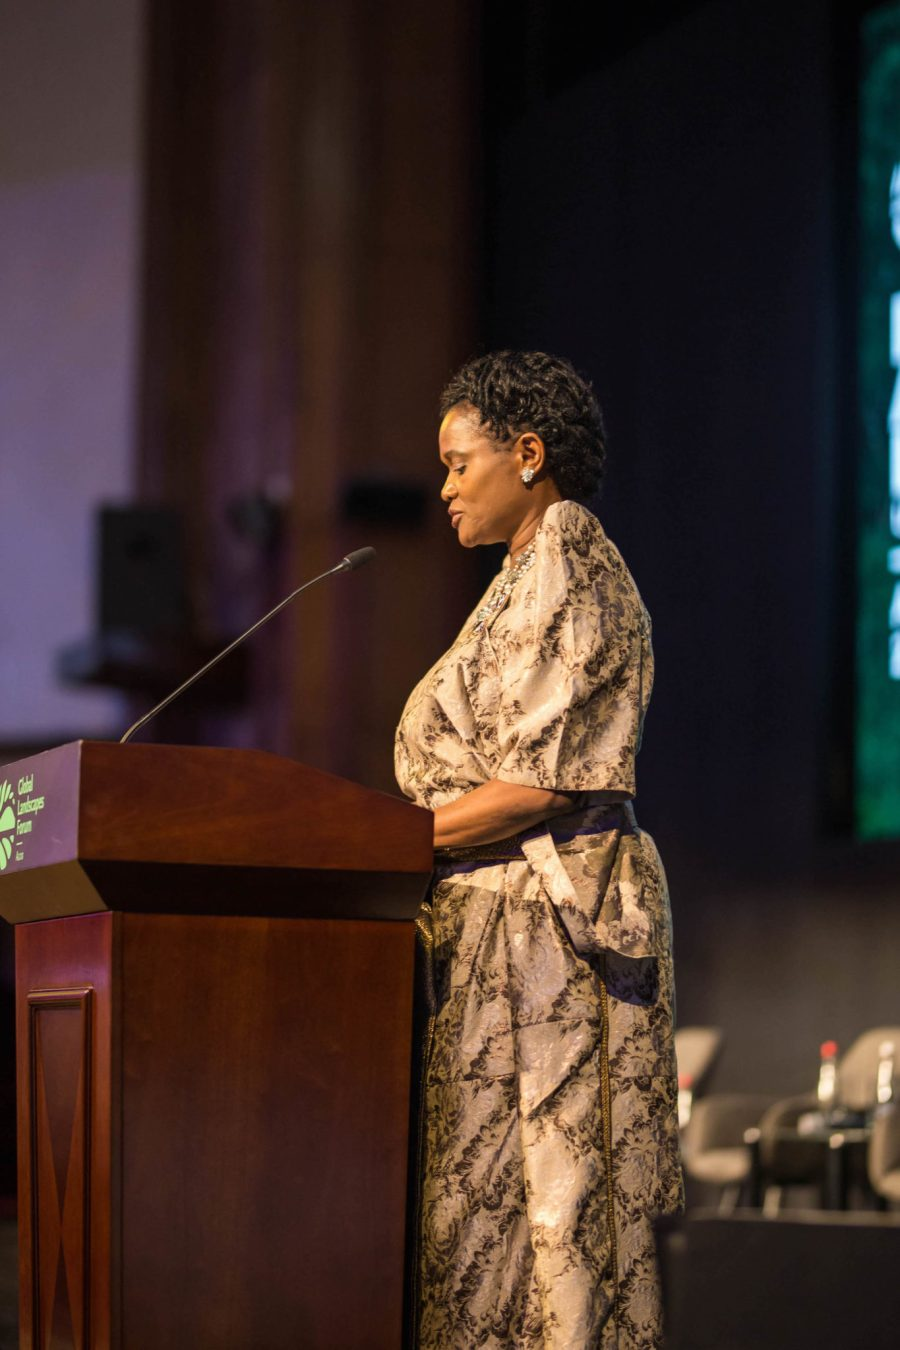 Her royal highness Sylvia Nagginda, the Nnabagereka (Queen) of Buganda, spoke on the importance of culture preservation in restoration. Musah Botchway, Global Landscapes Forum